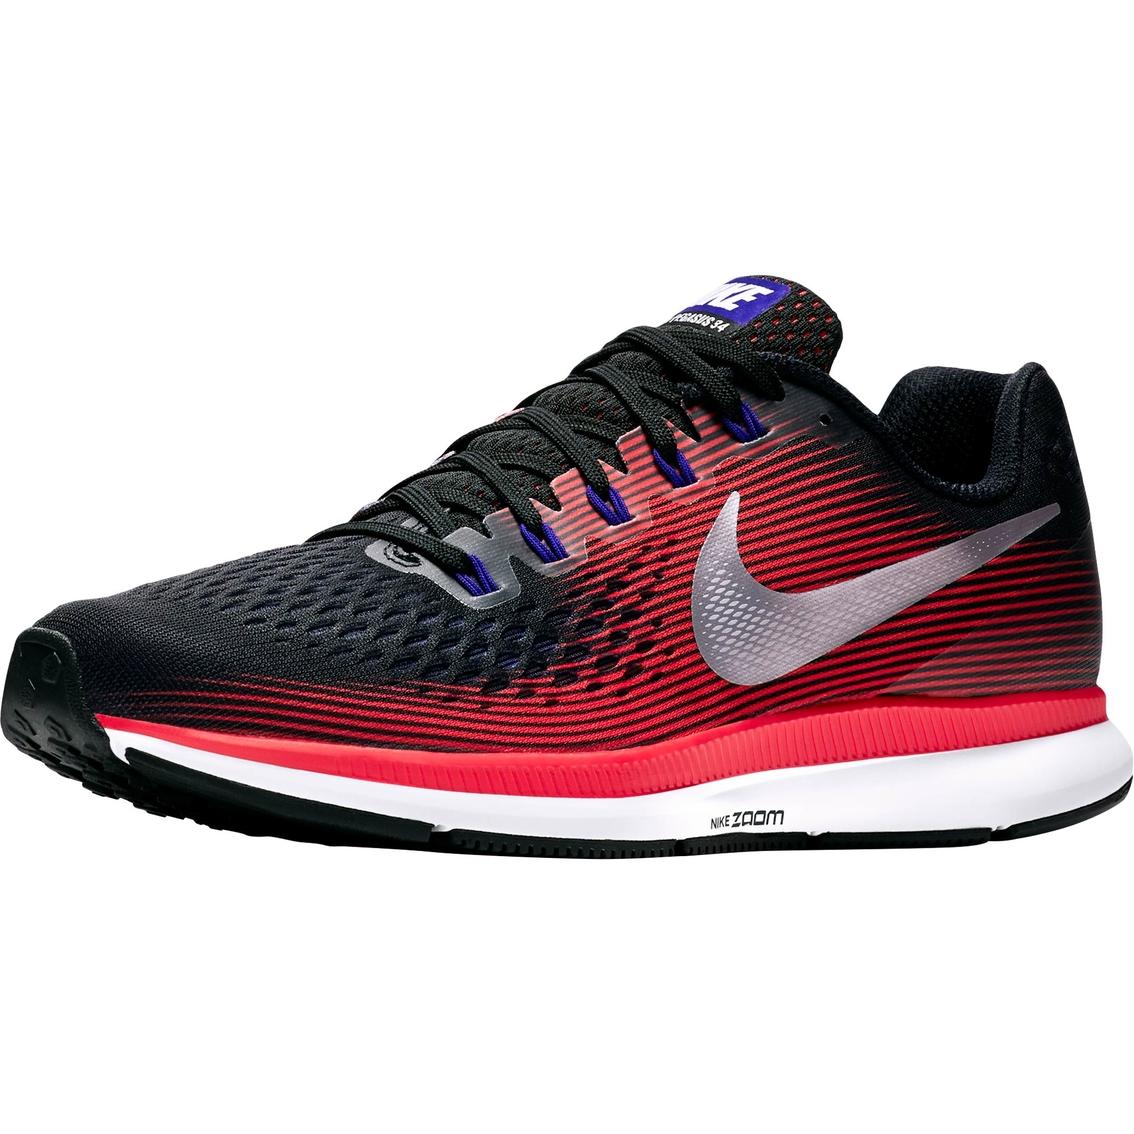 80e0c9610fd Nike Men s Air Zoom Pegasus 34 Running Shoes